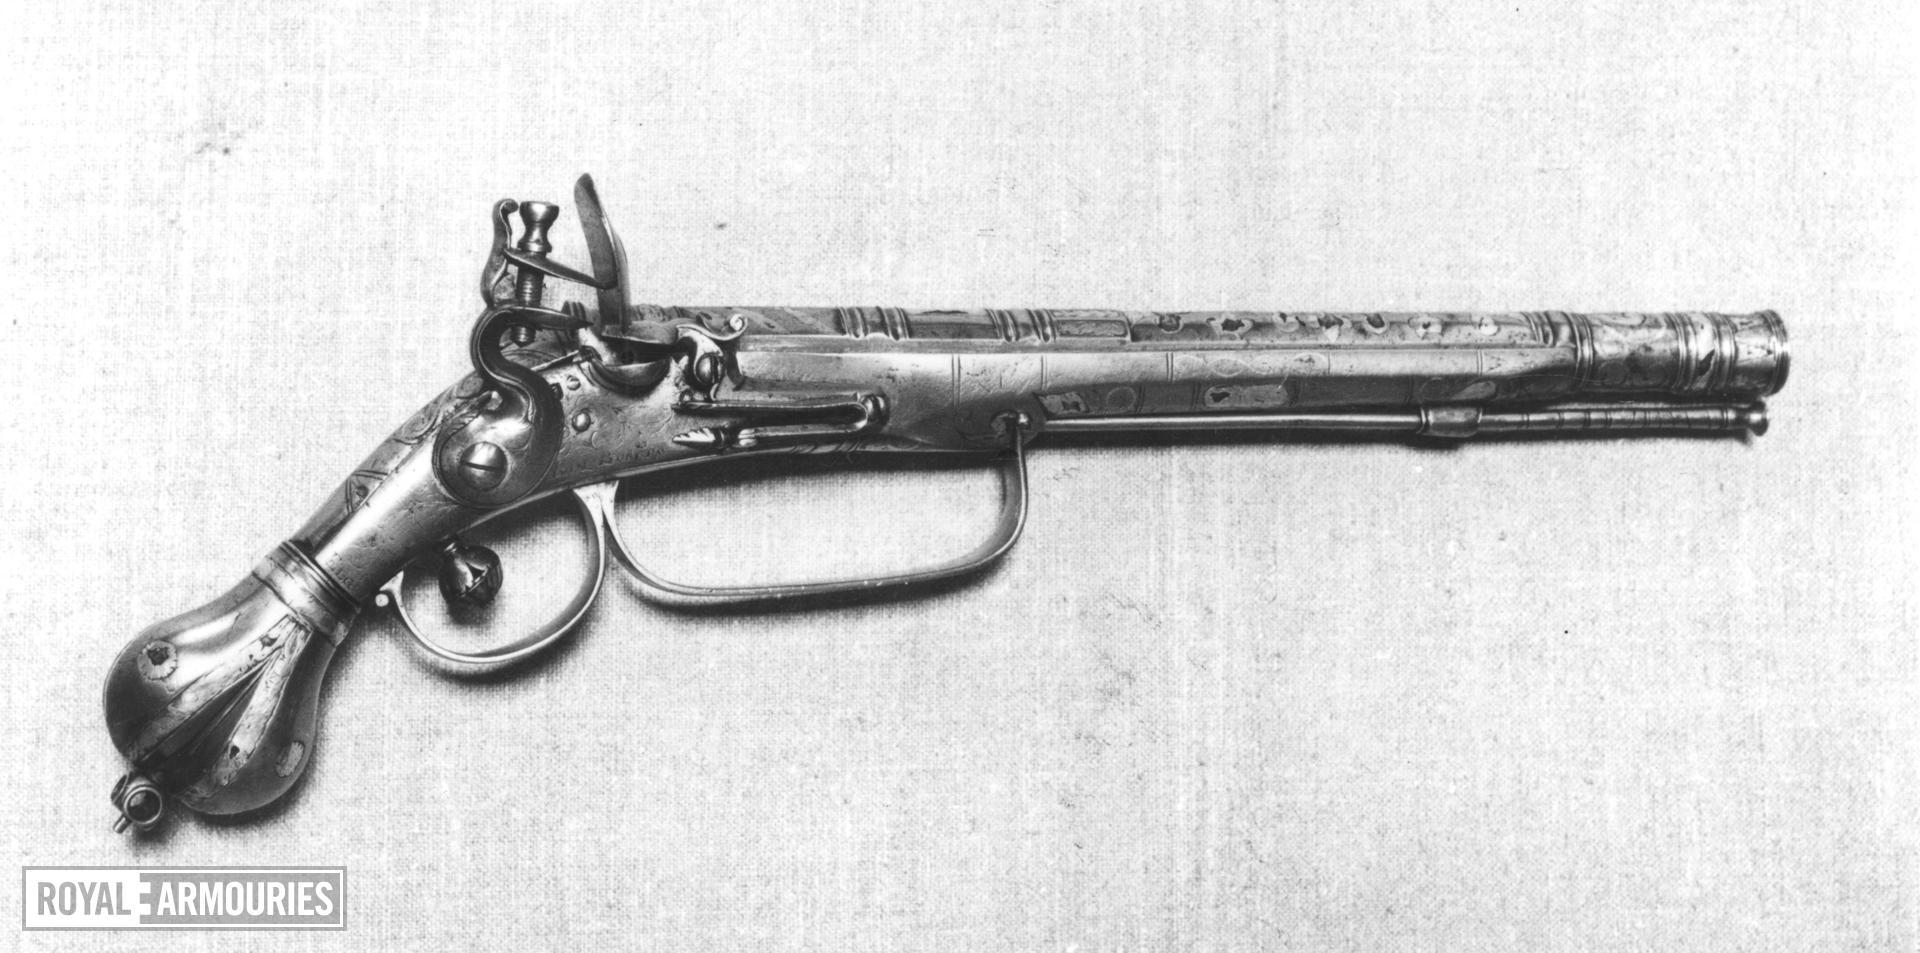 Flintlock pistol By John Burges